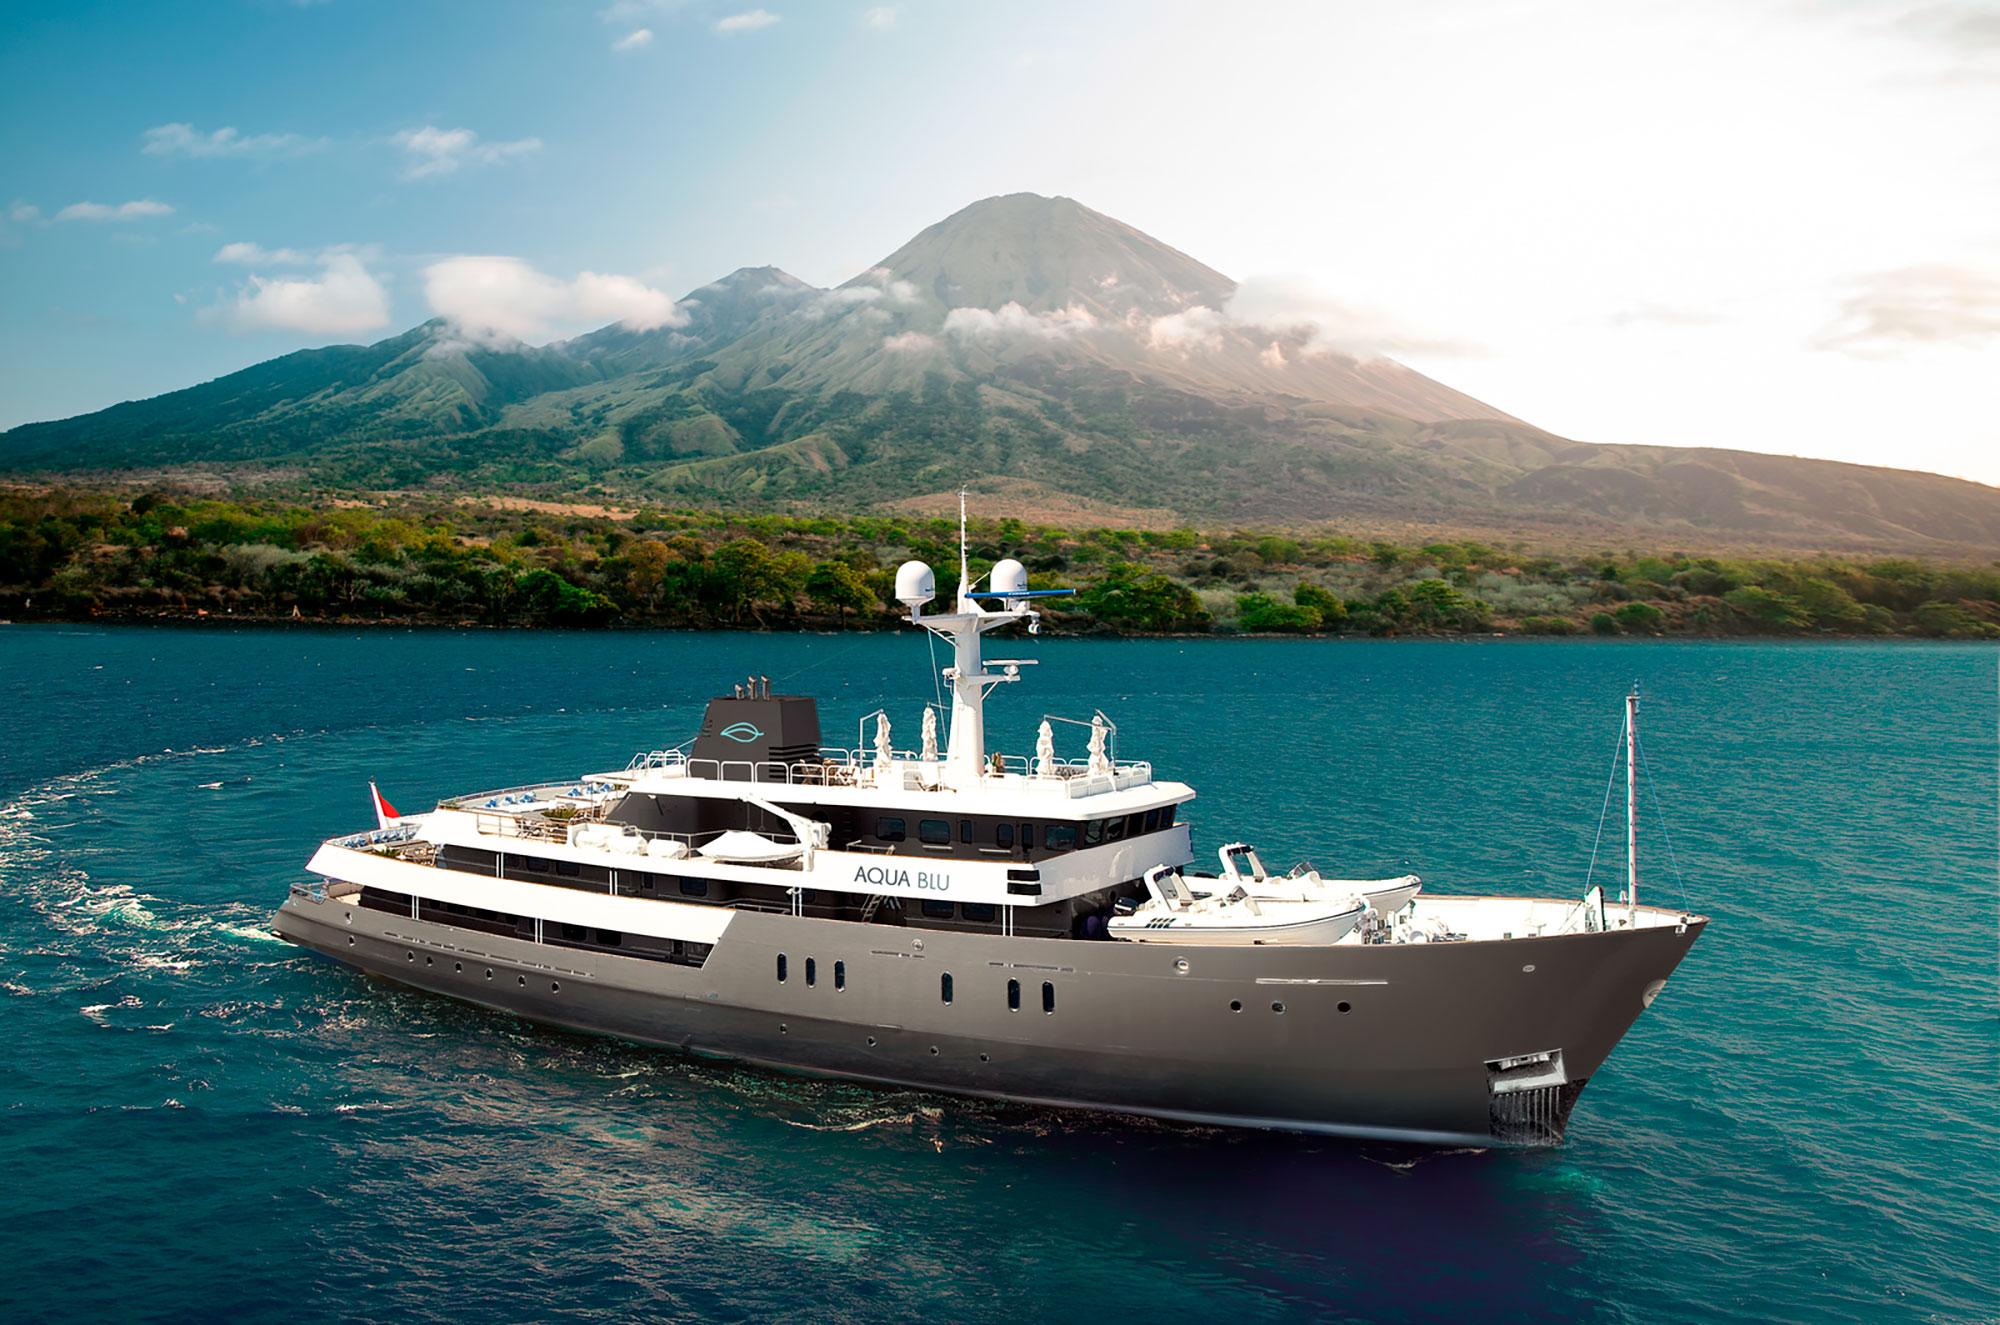 Crucero AQUA BLU de 7 noches - Ambon & Spice Islands - Indonesia- imagen #9